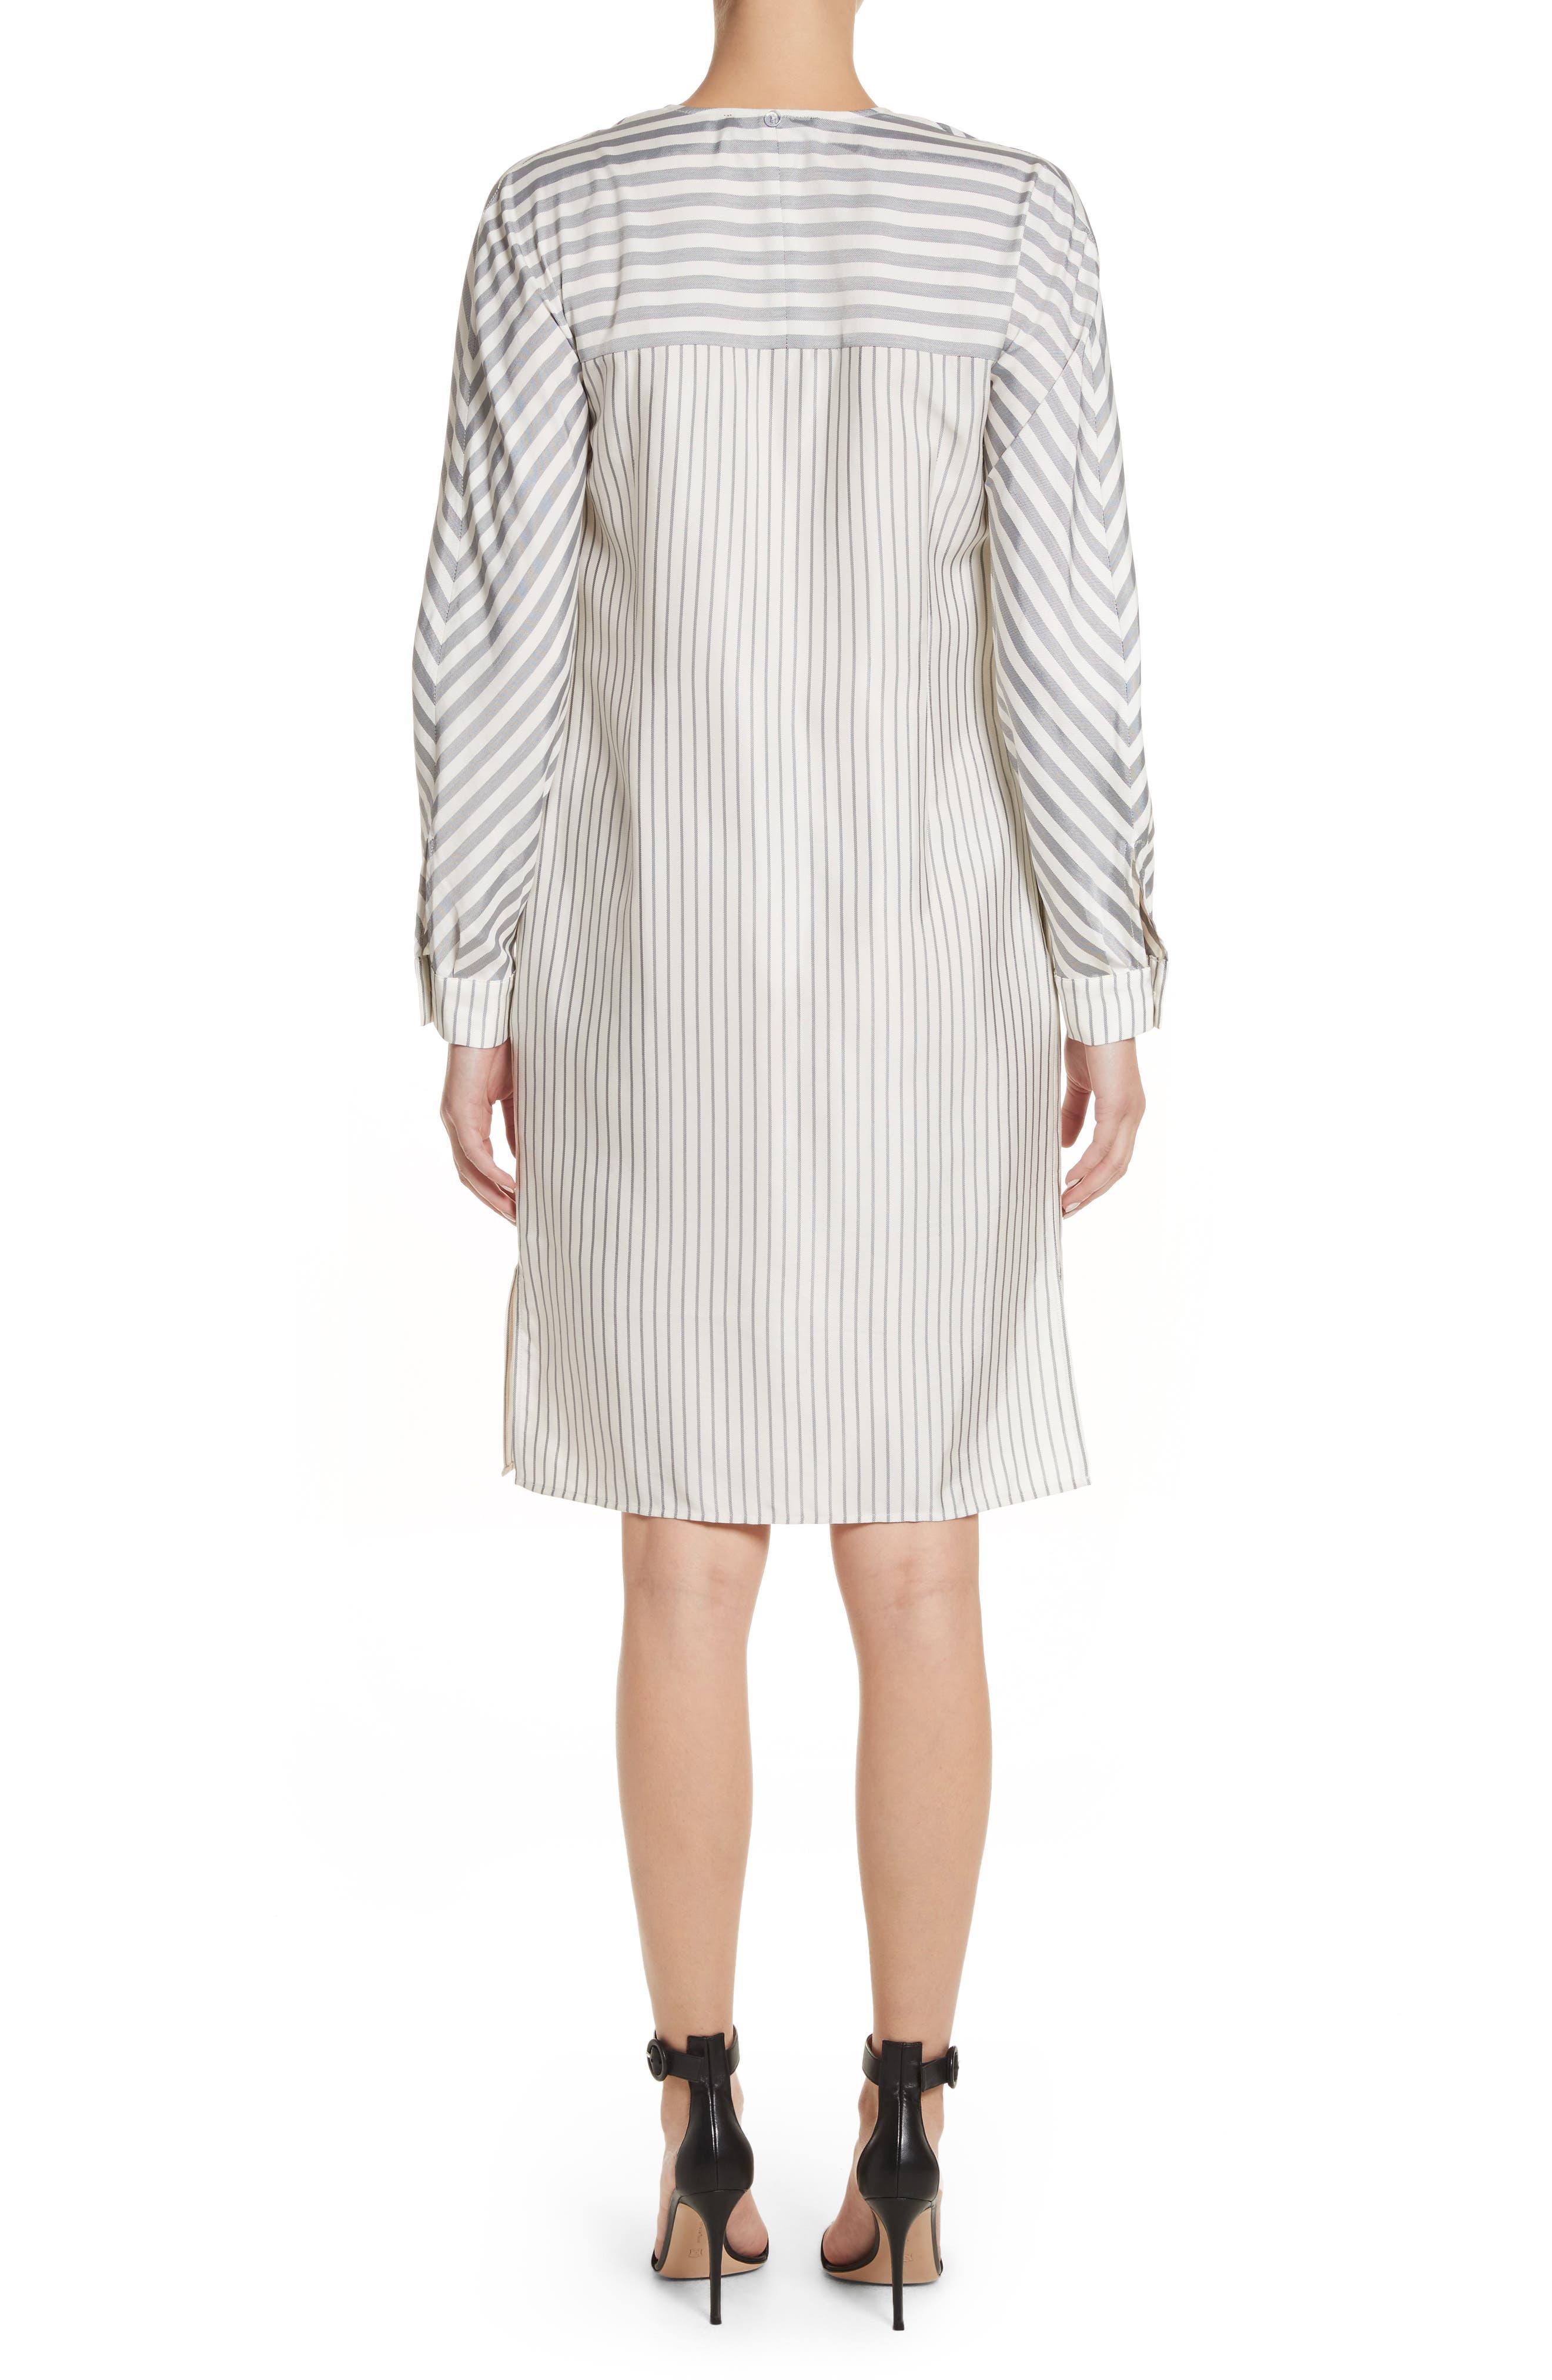 ST. JOHN COLLECTION,                             Stripe Tie Neck Shirtdress,                             Alternate thumbnail 2, color,                             900